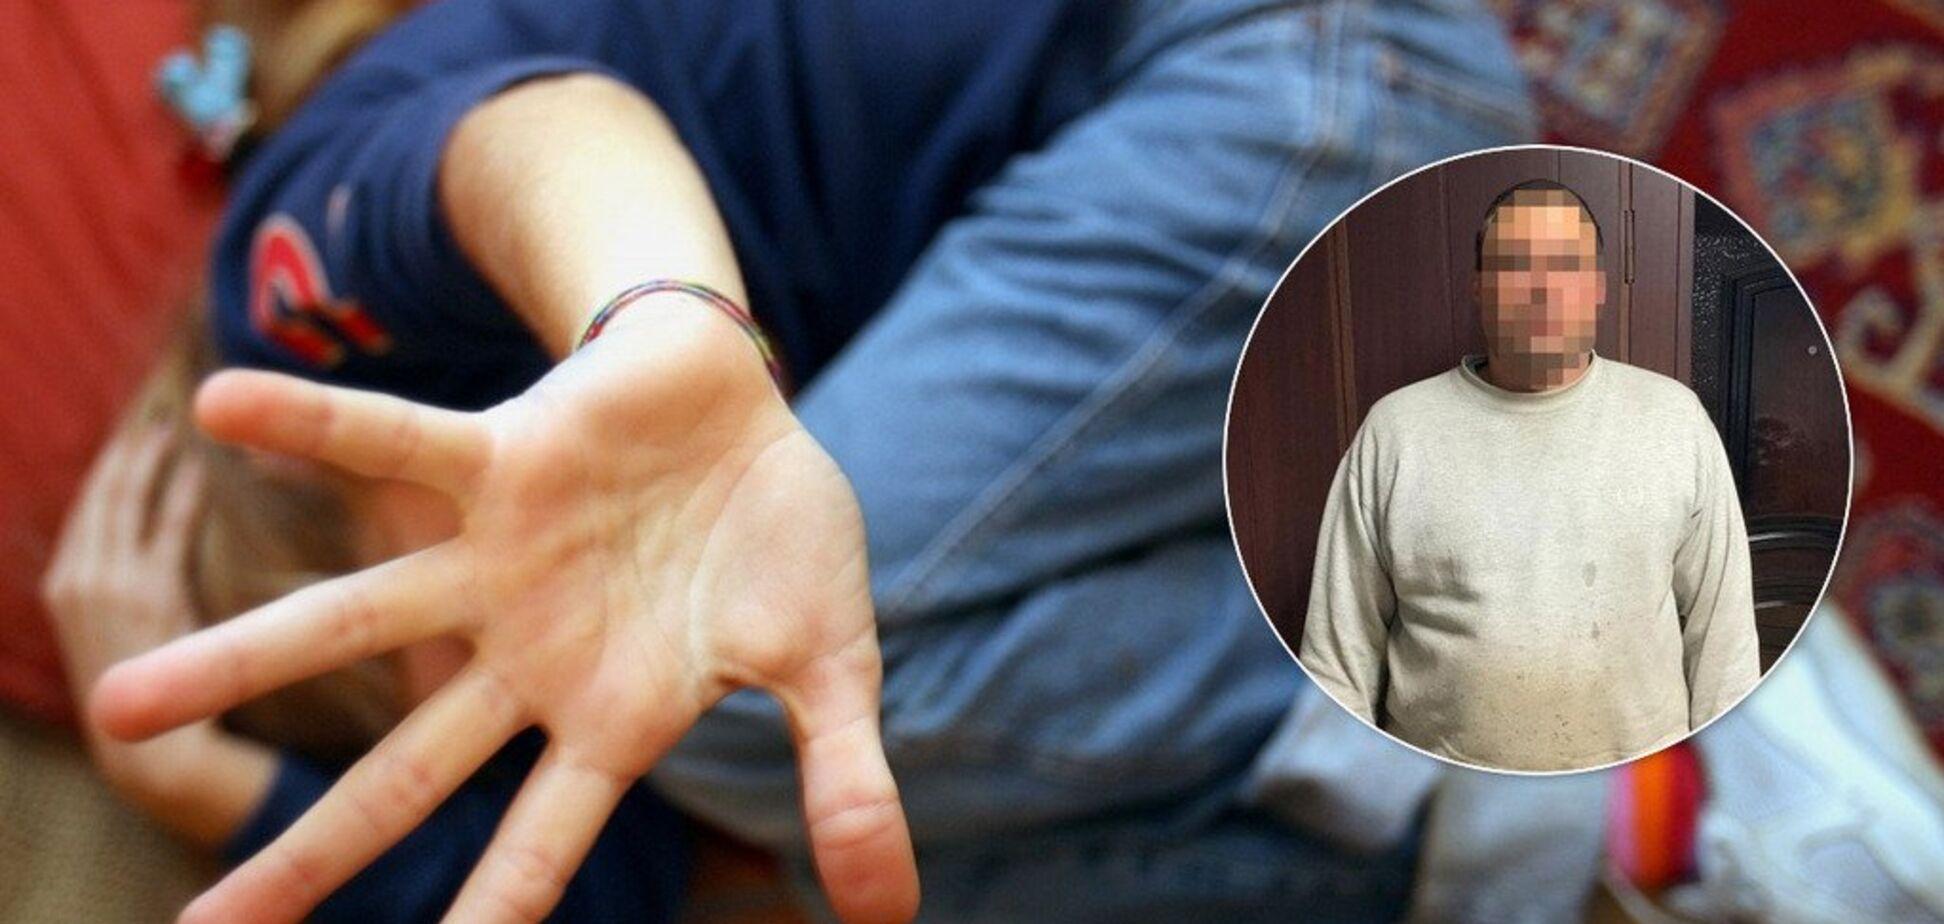 Пока матери не было дома: под Днепром мужчина изнасиловал ребенка